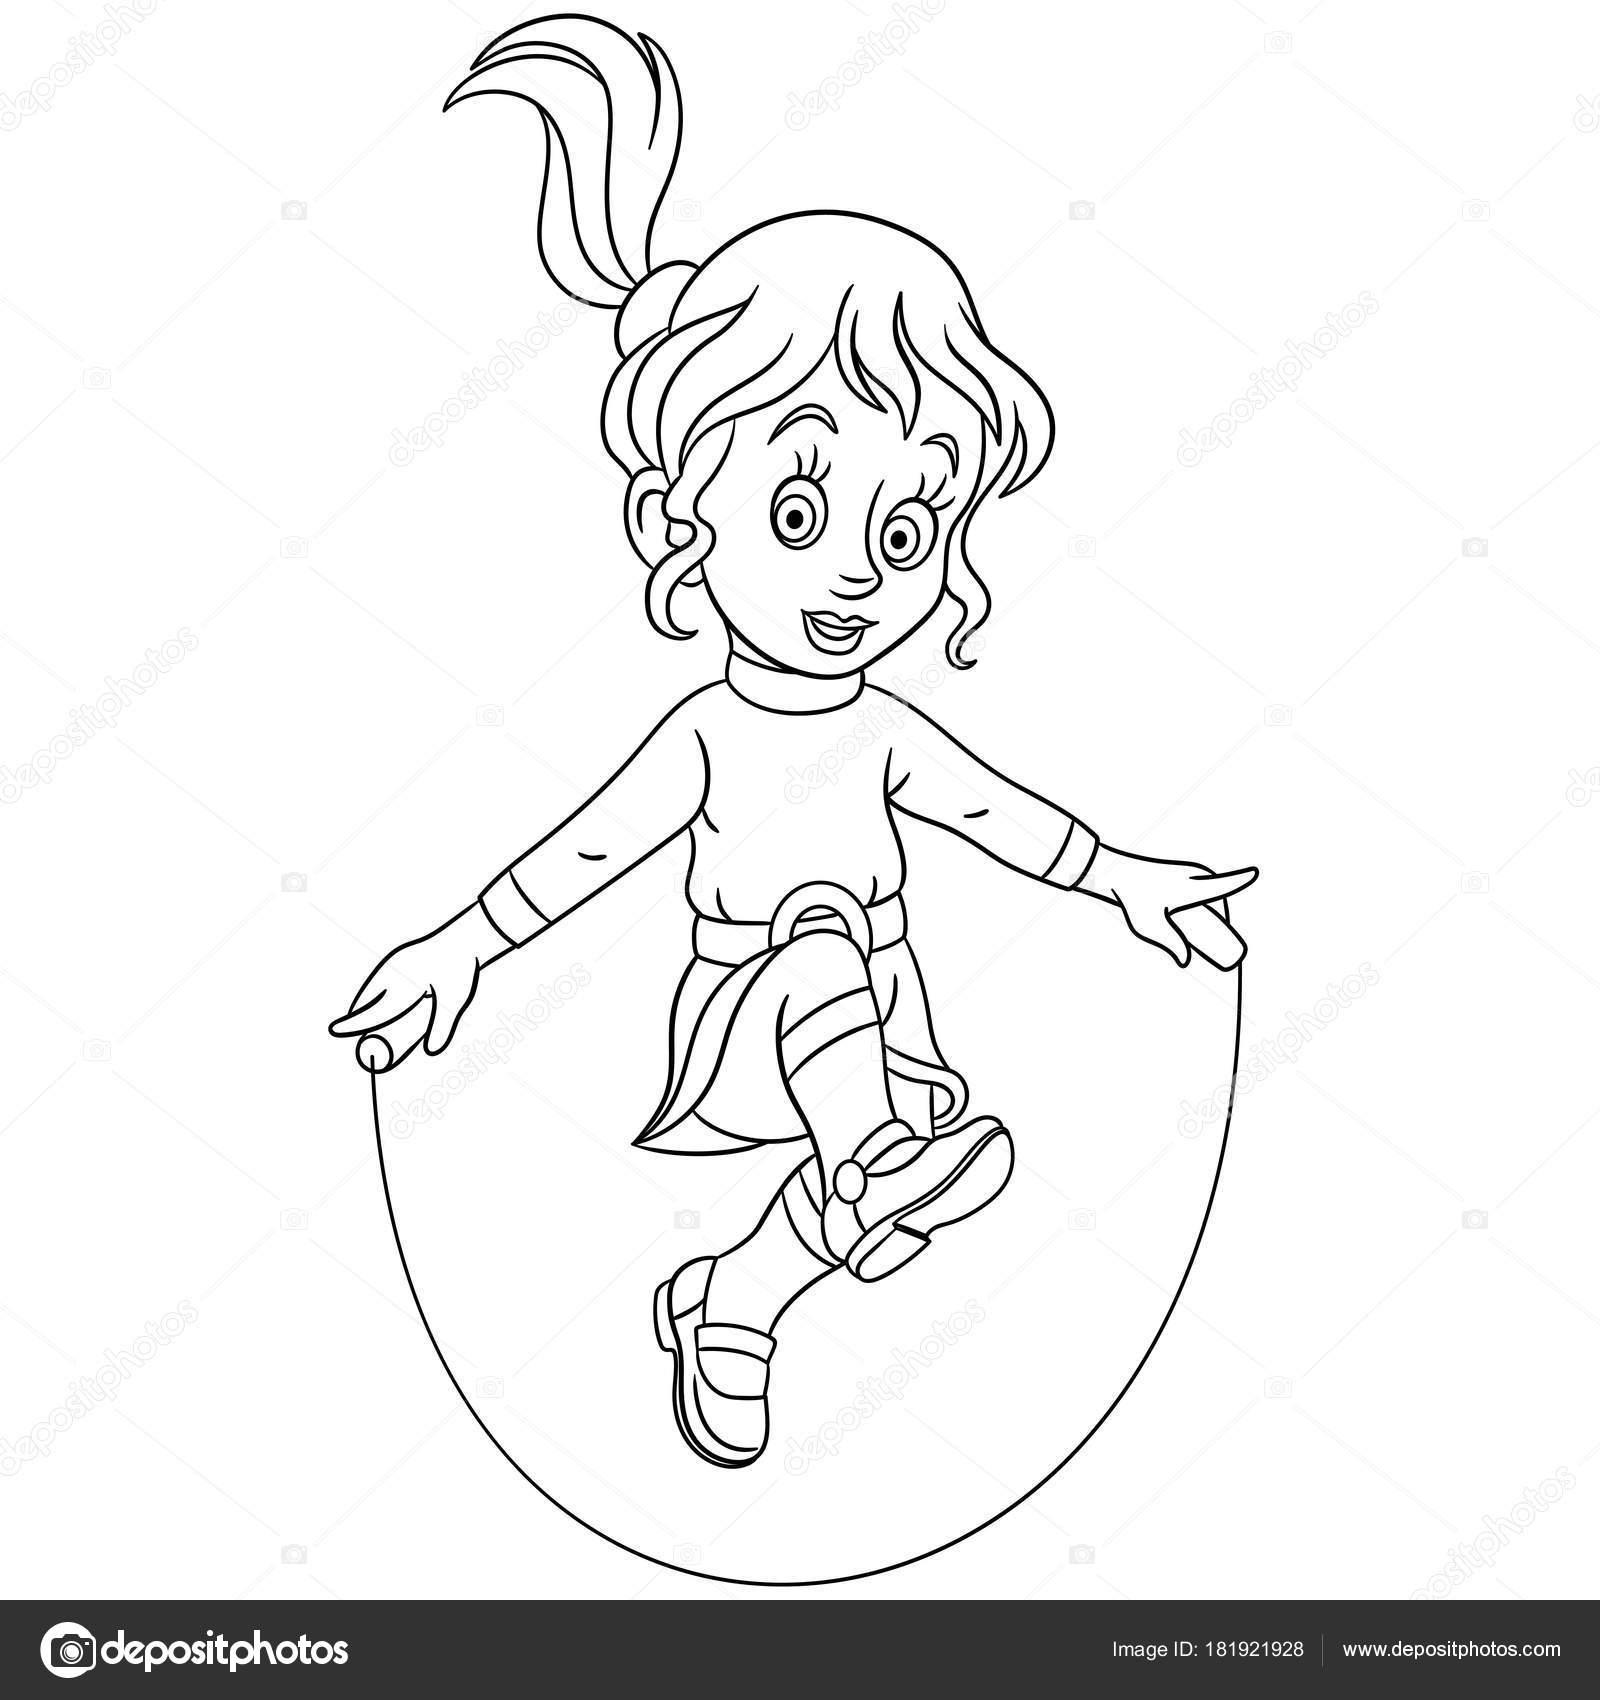 Coloring Page Cartoon Girl Jumping Skipping Rope Design Kids